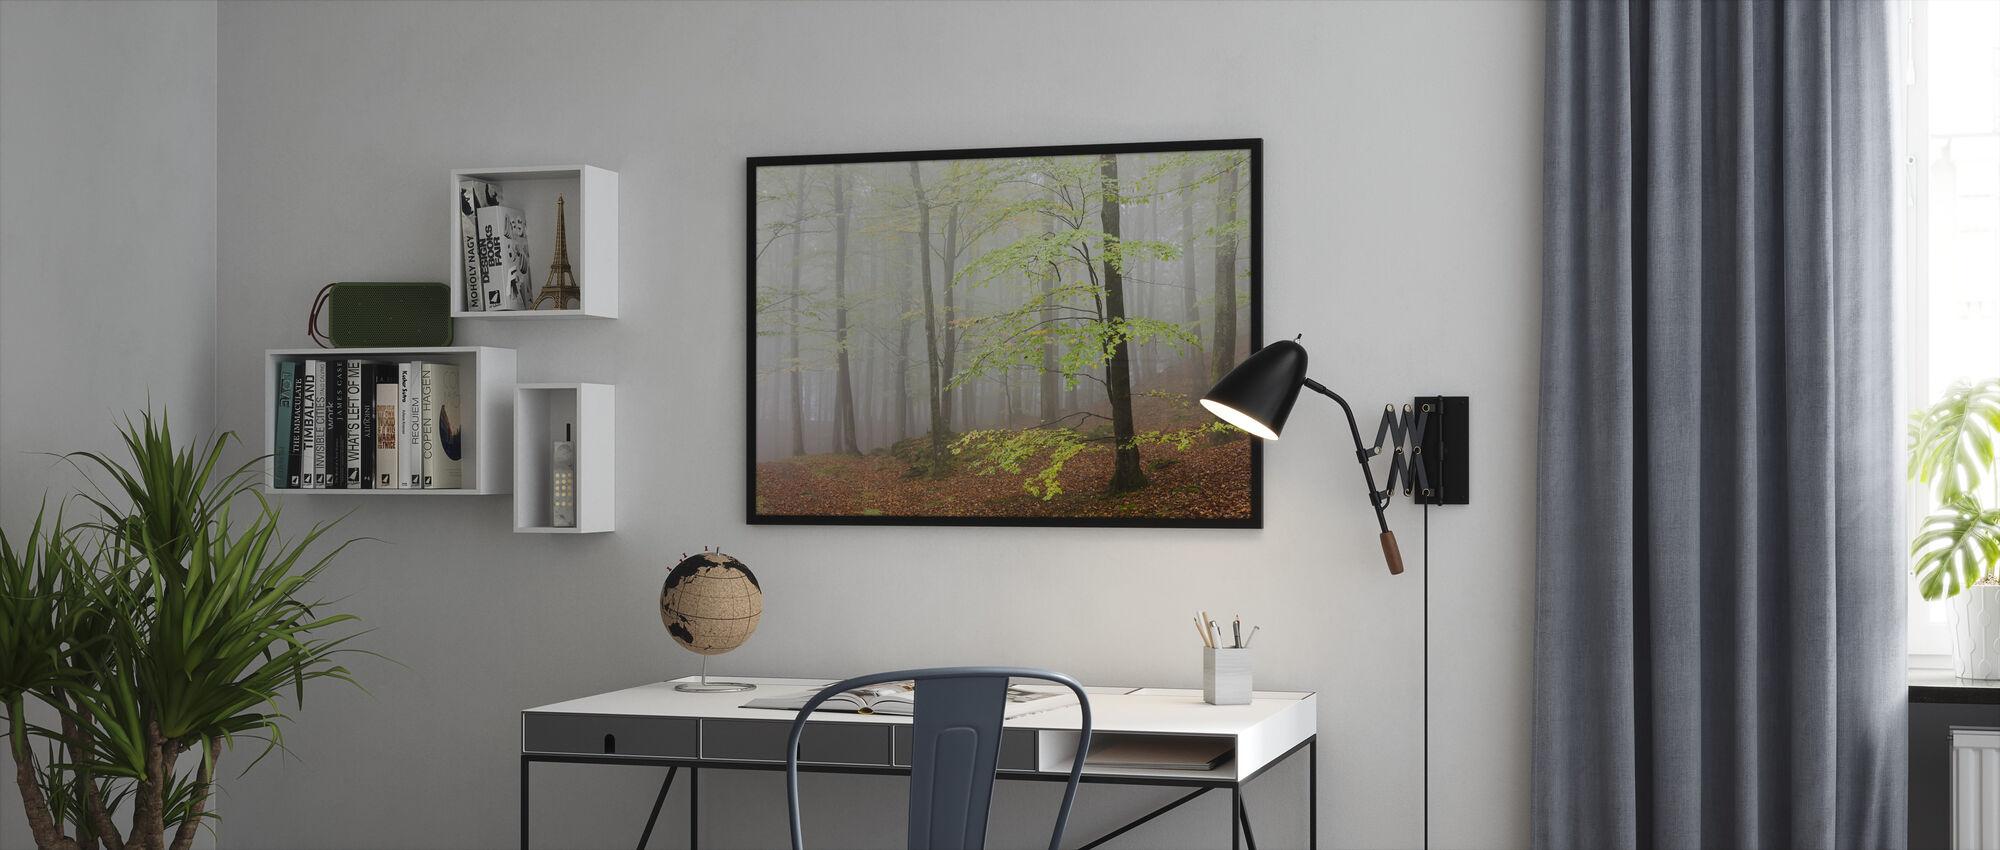 Clowing Hallar Beech Forest, Sweden I, Europe - Framed print - Office